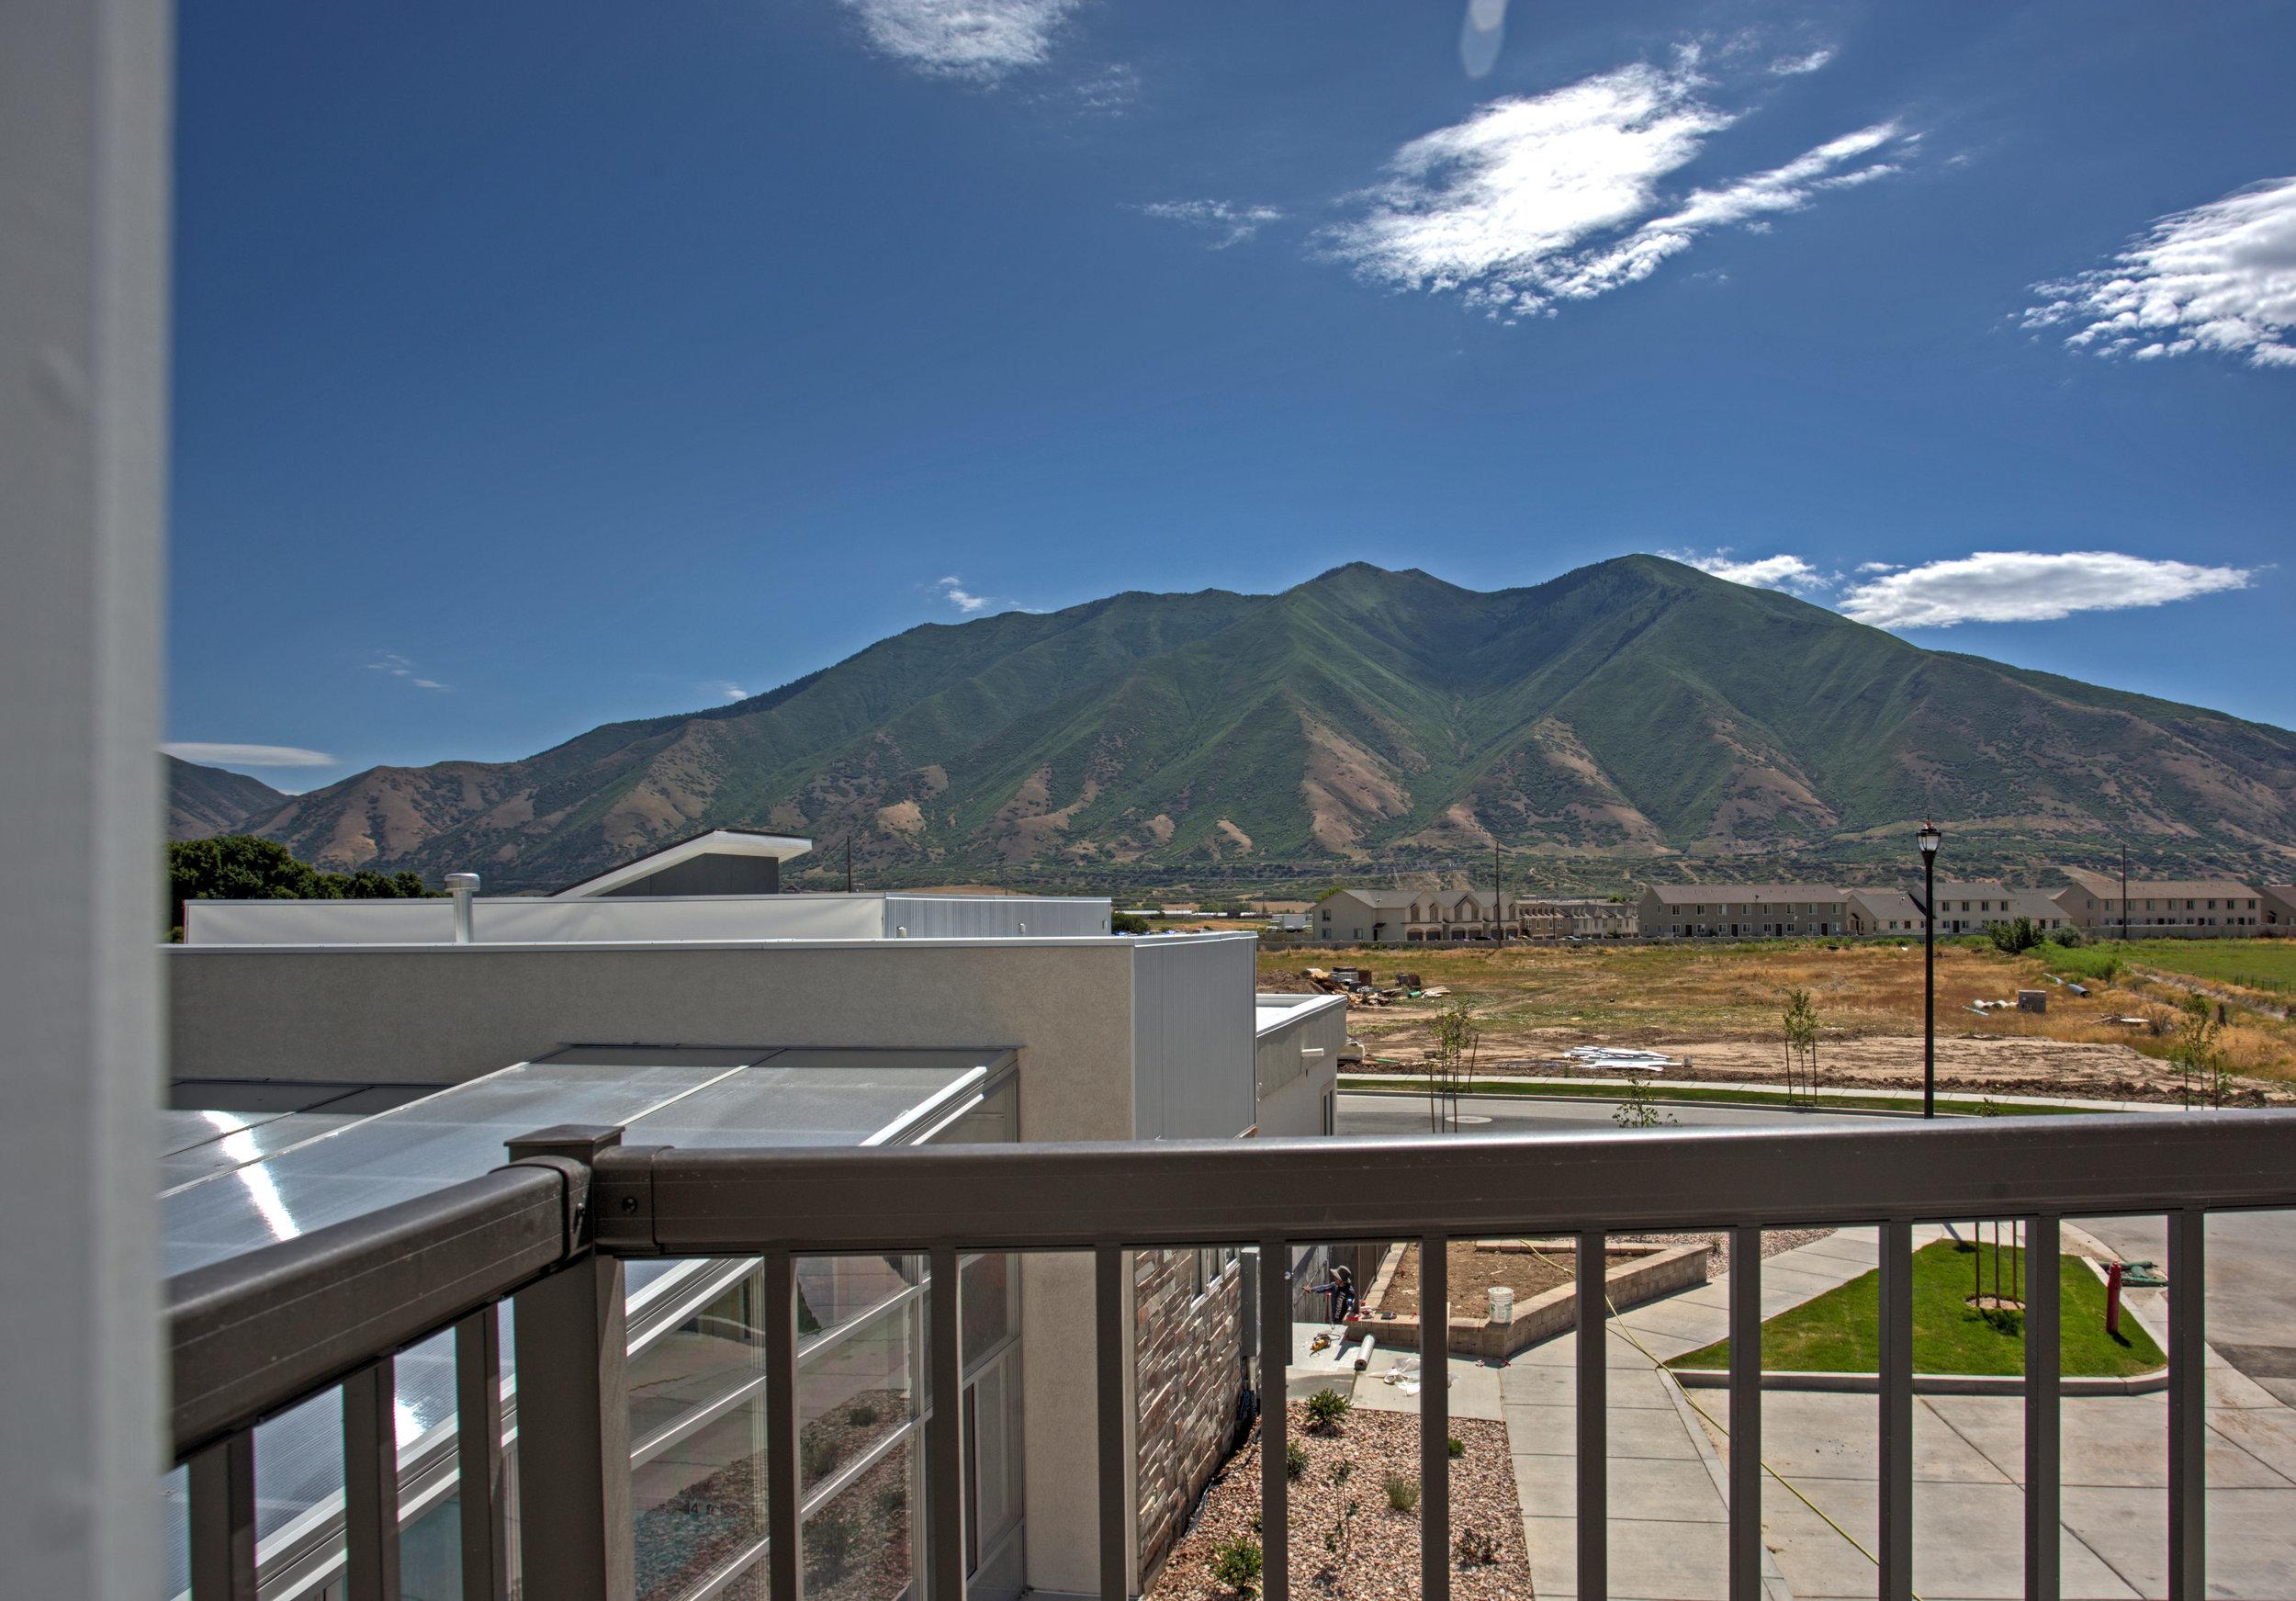 988 S High Ridge Rd Spanish-print-030-4-988SHighRidgeRd33-4200x2930-300dpi.jpg